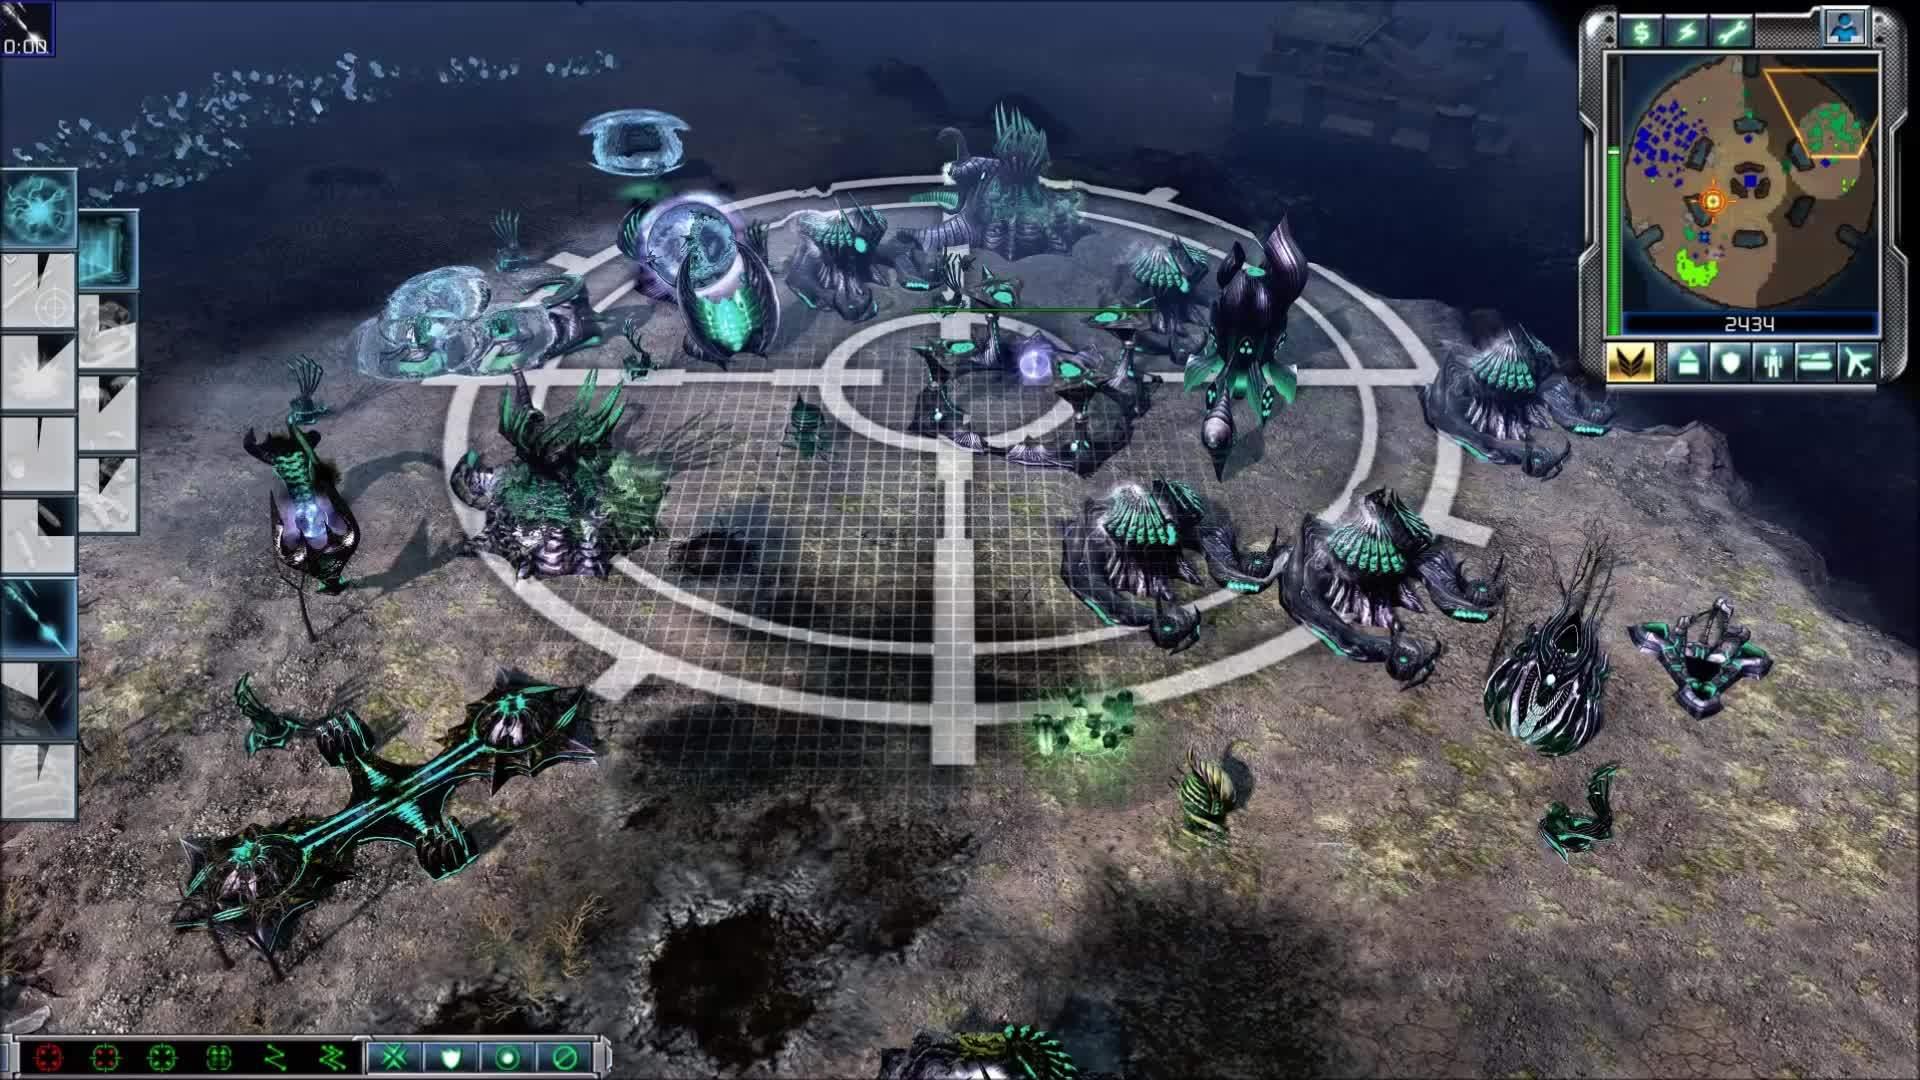 60fpsgaminggifs, commandandconquer, CNC3 Tiberium Wars ION $%@ing Cannon (reddit) GIFs